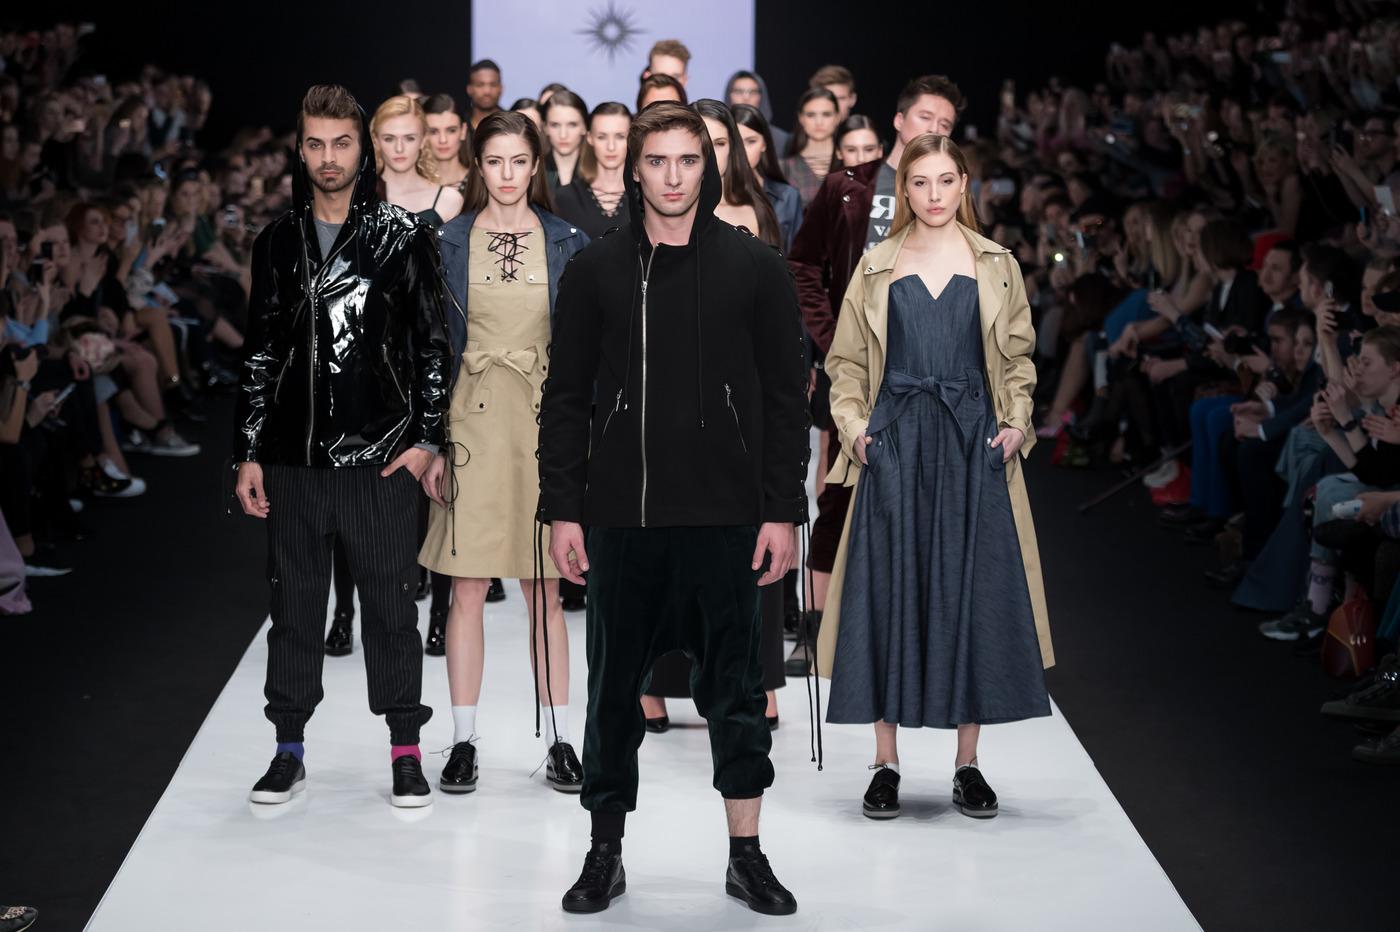 Врамках Мерседес Бенс Fashion Week Russia состоялась презентация трендов нового сезона